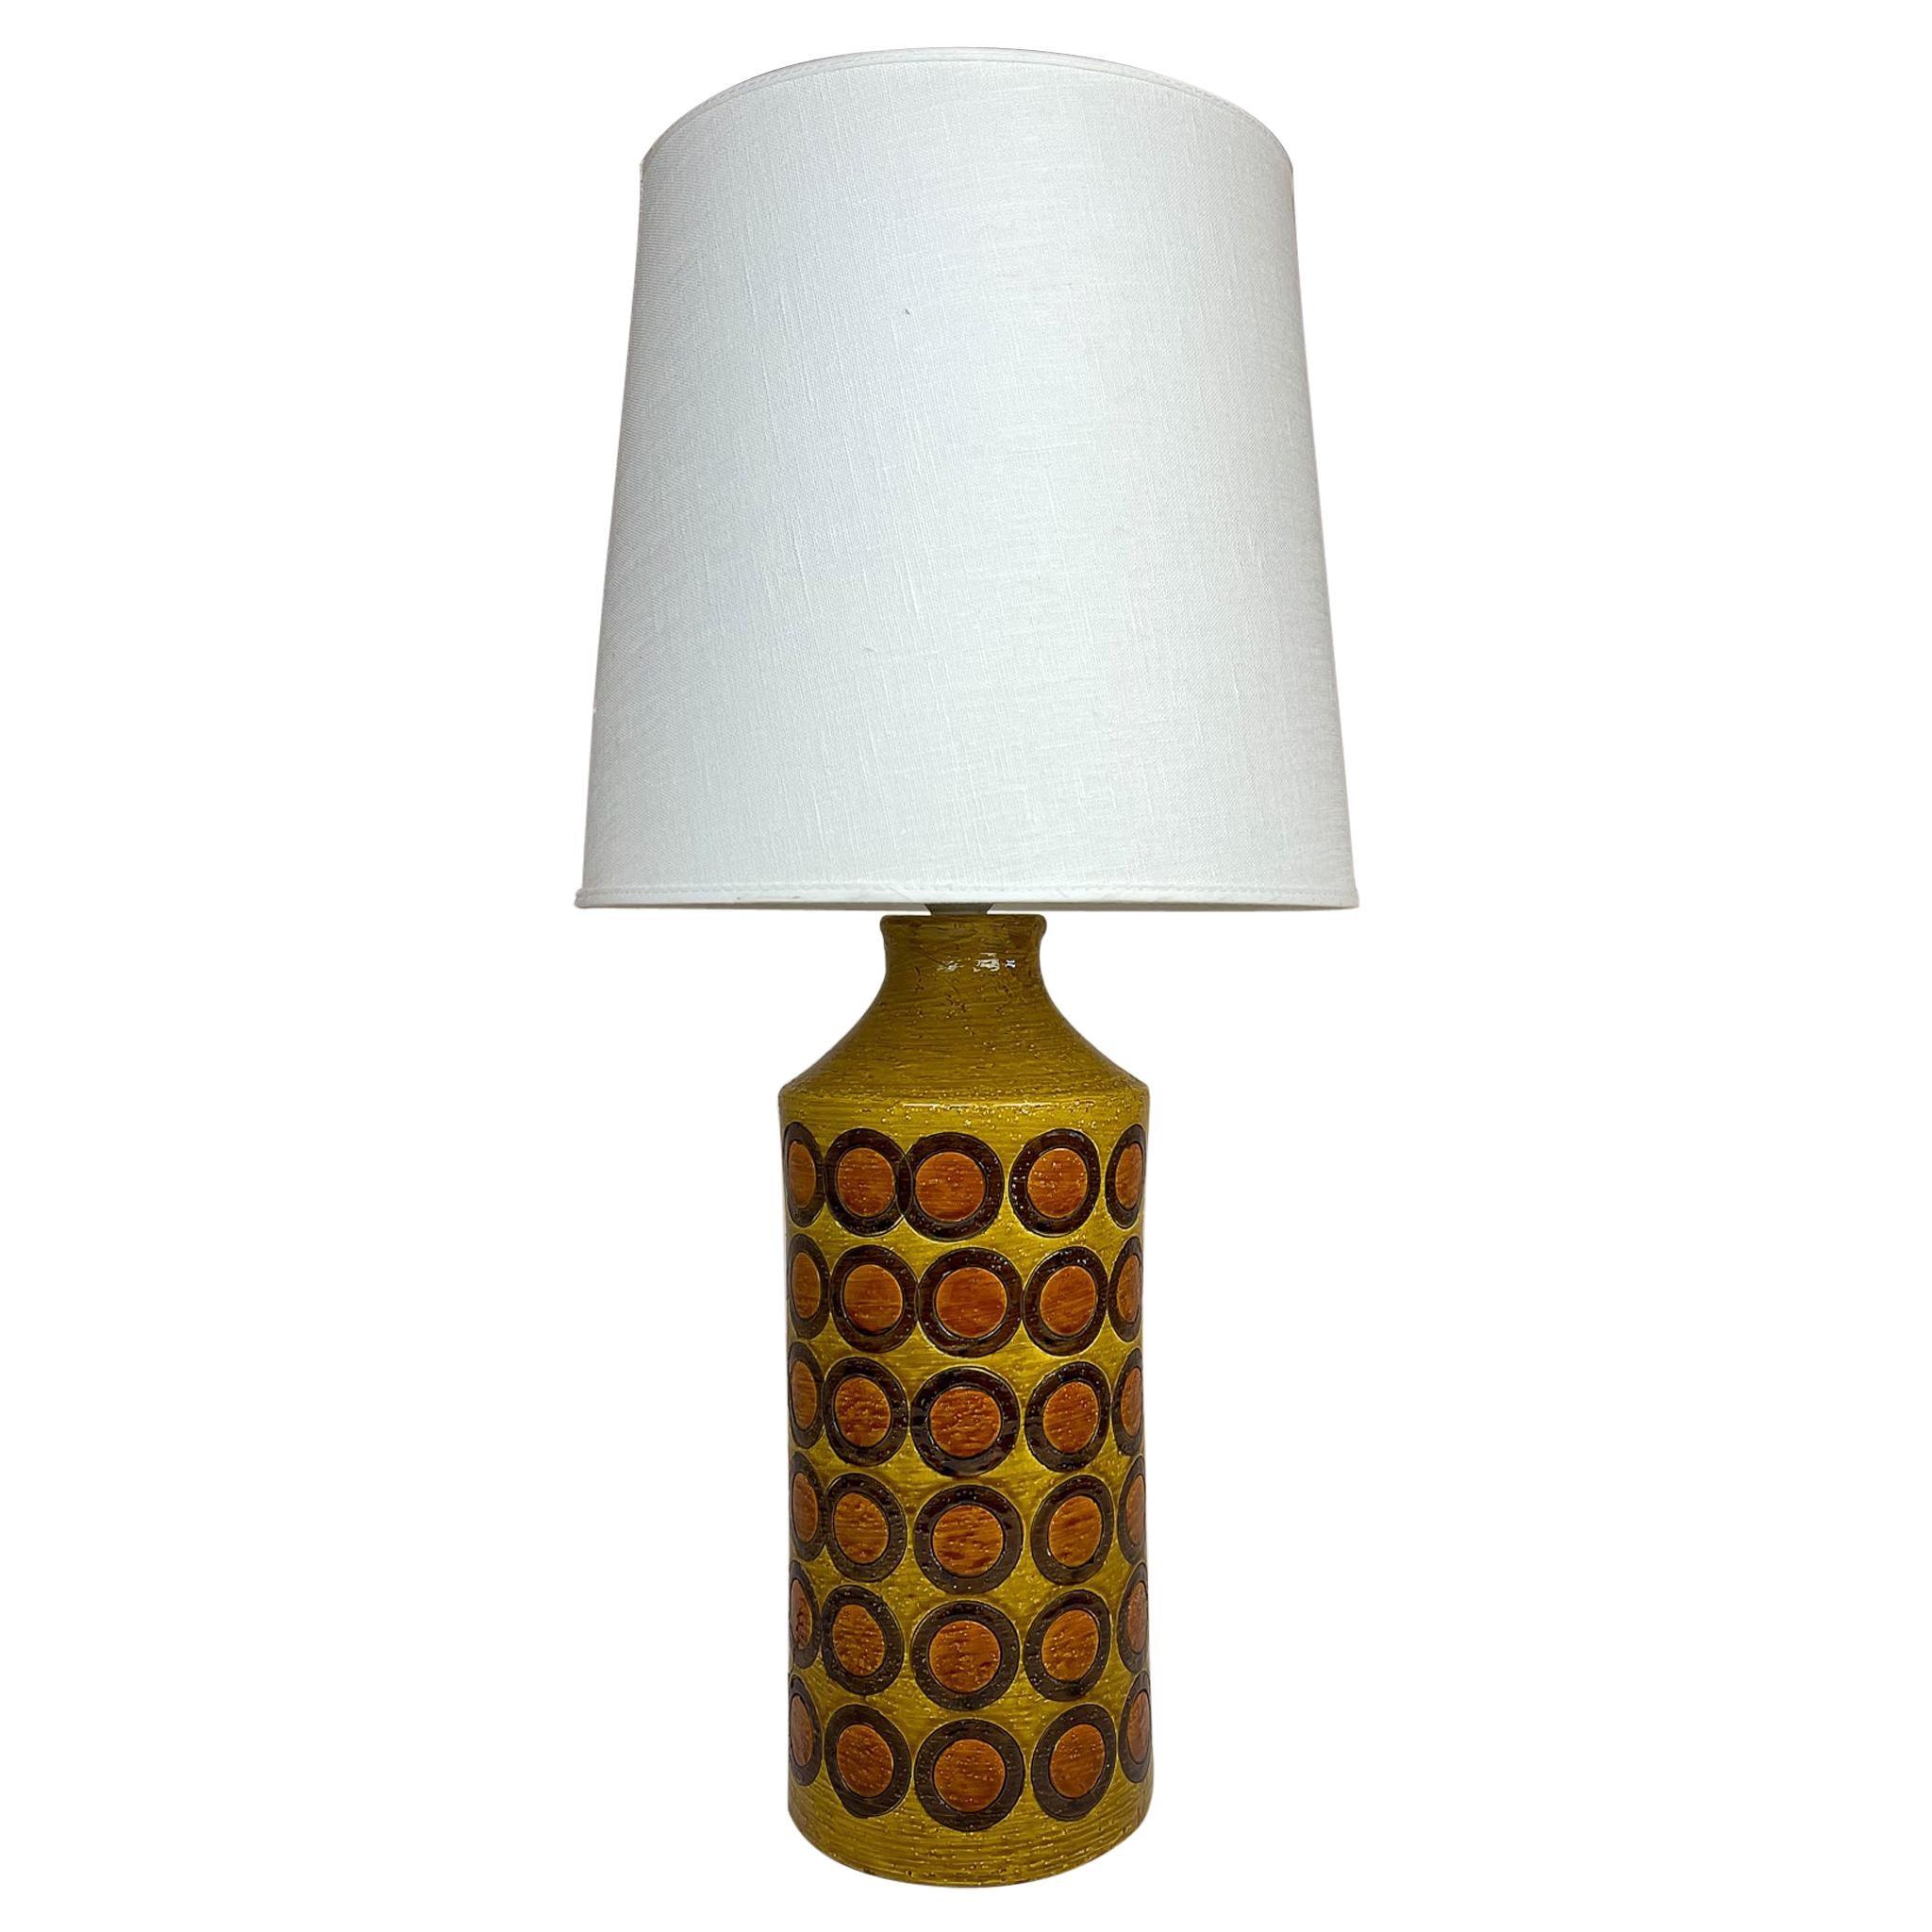 Midcentury Ceramic Table Lamp Bergbom Bitossi, Italy